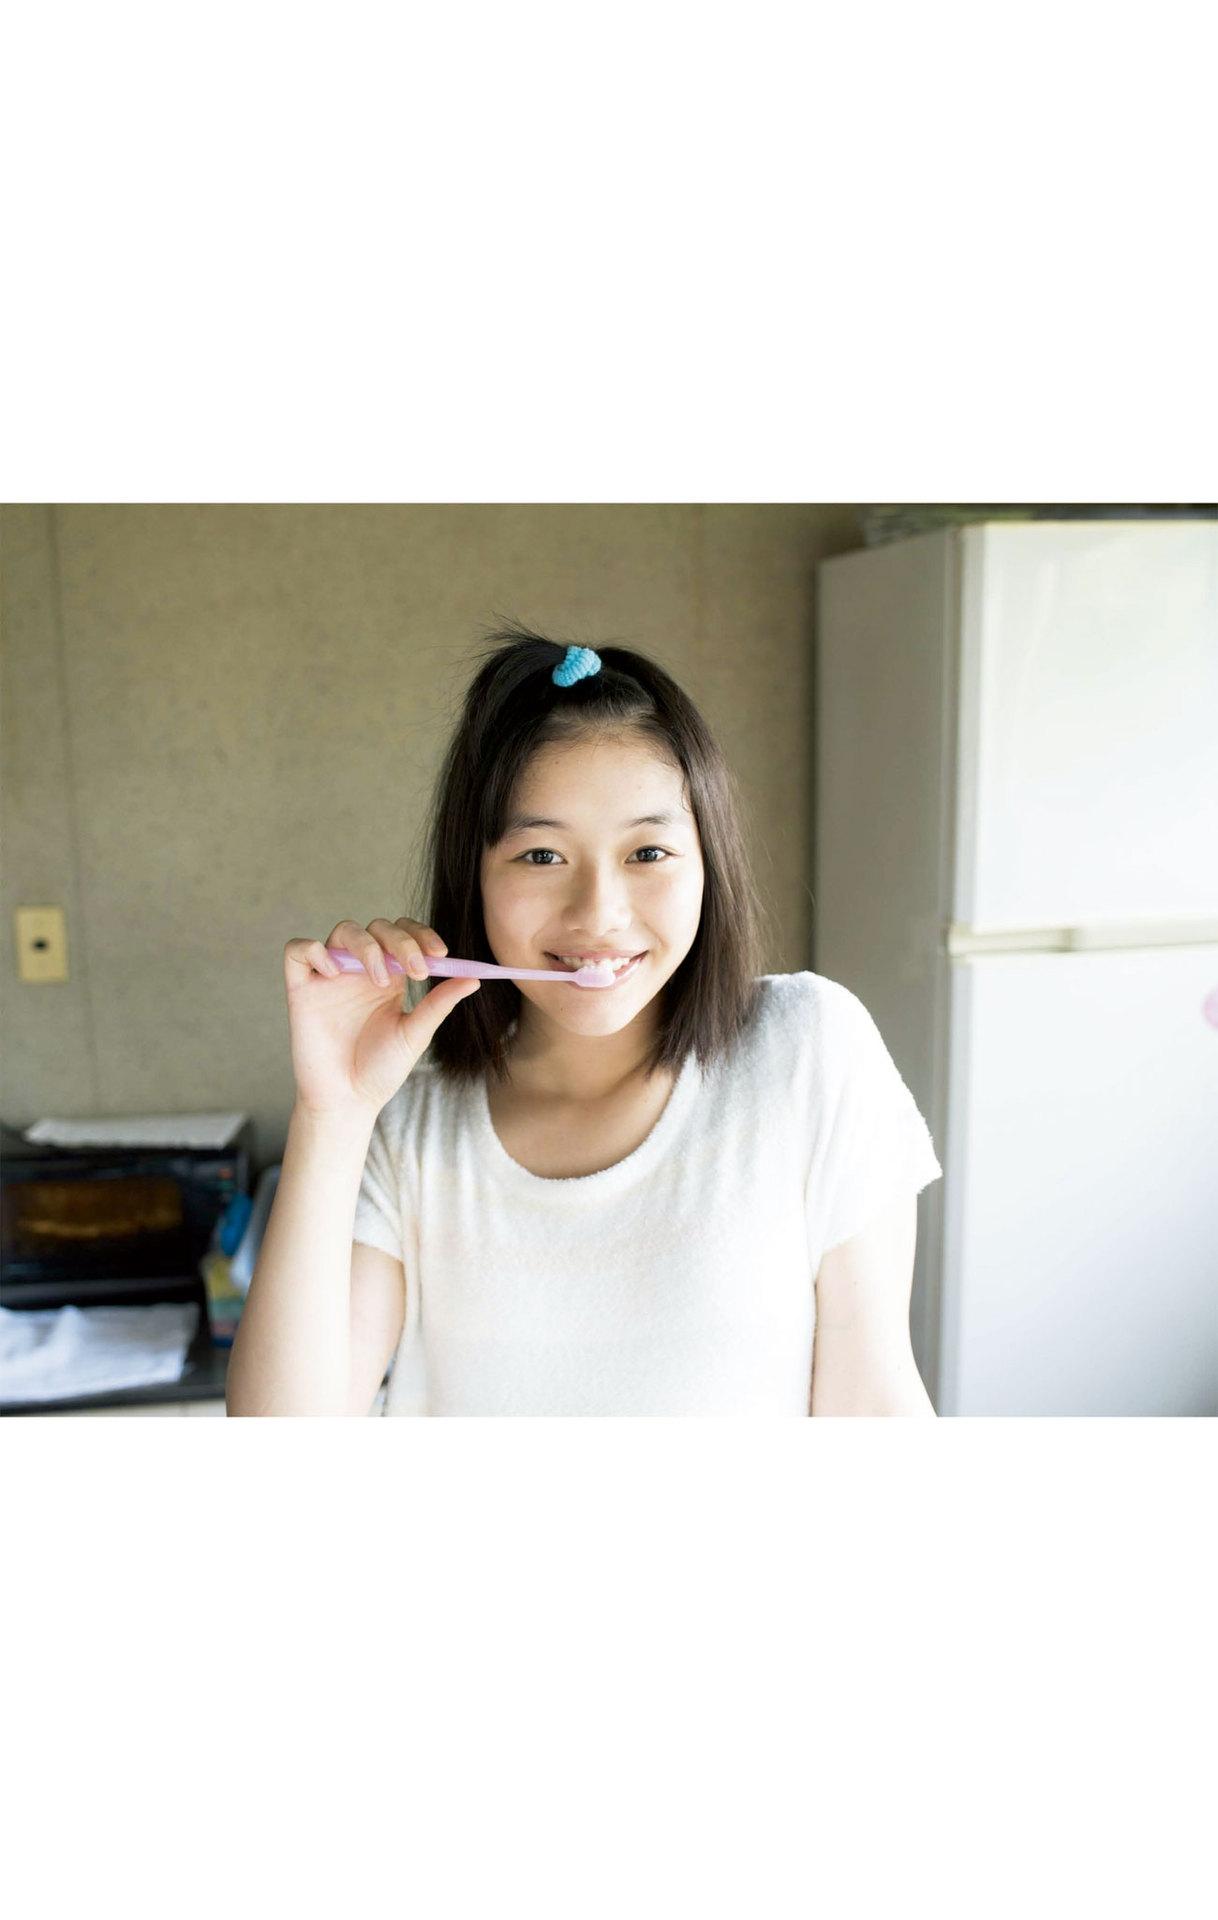 Summer Vacation Uniform After School Youth Bikini012